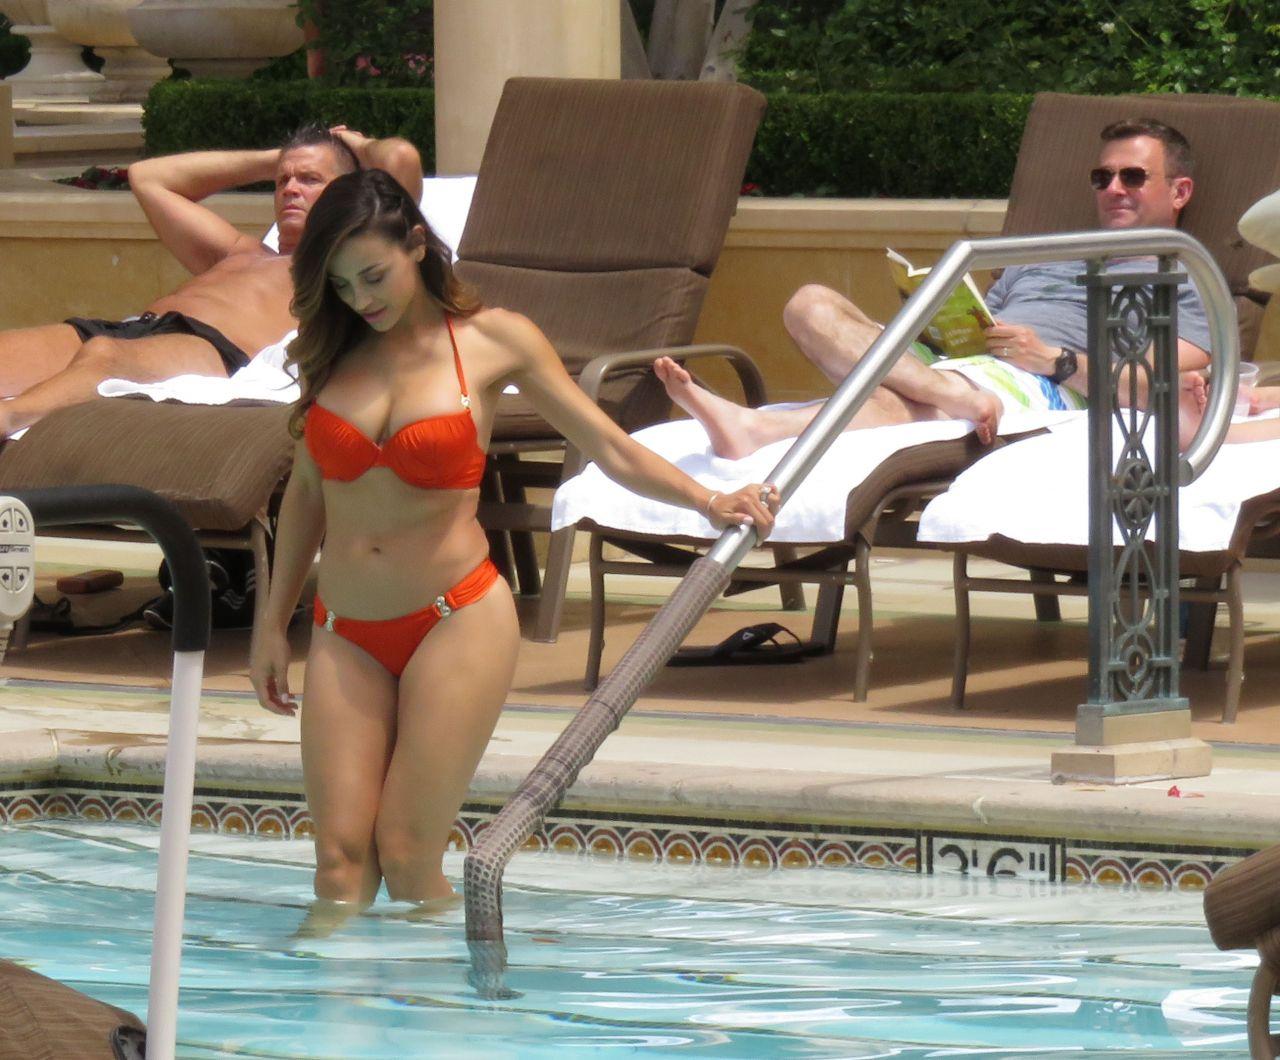 Ana cheri hot in bikini at the pool in las vegas may 2015 for Pool show vegas 2015